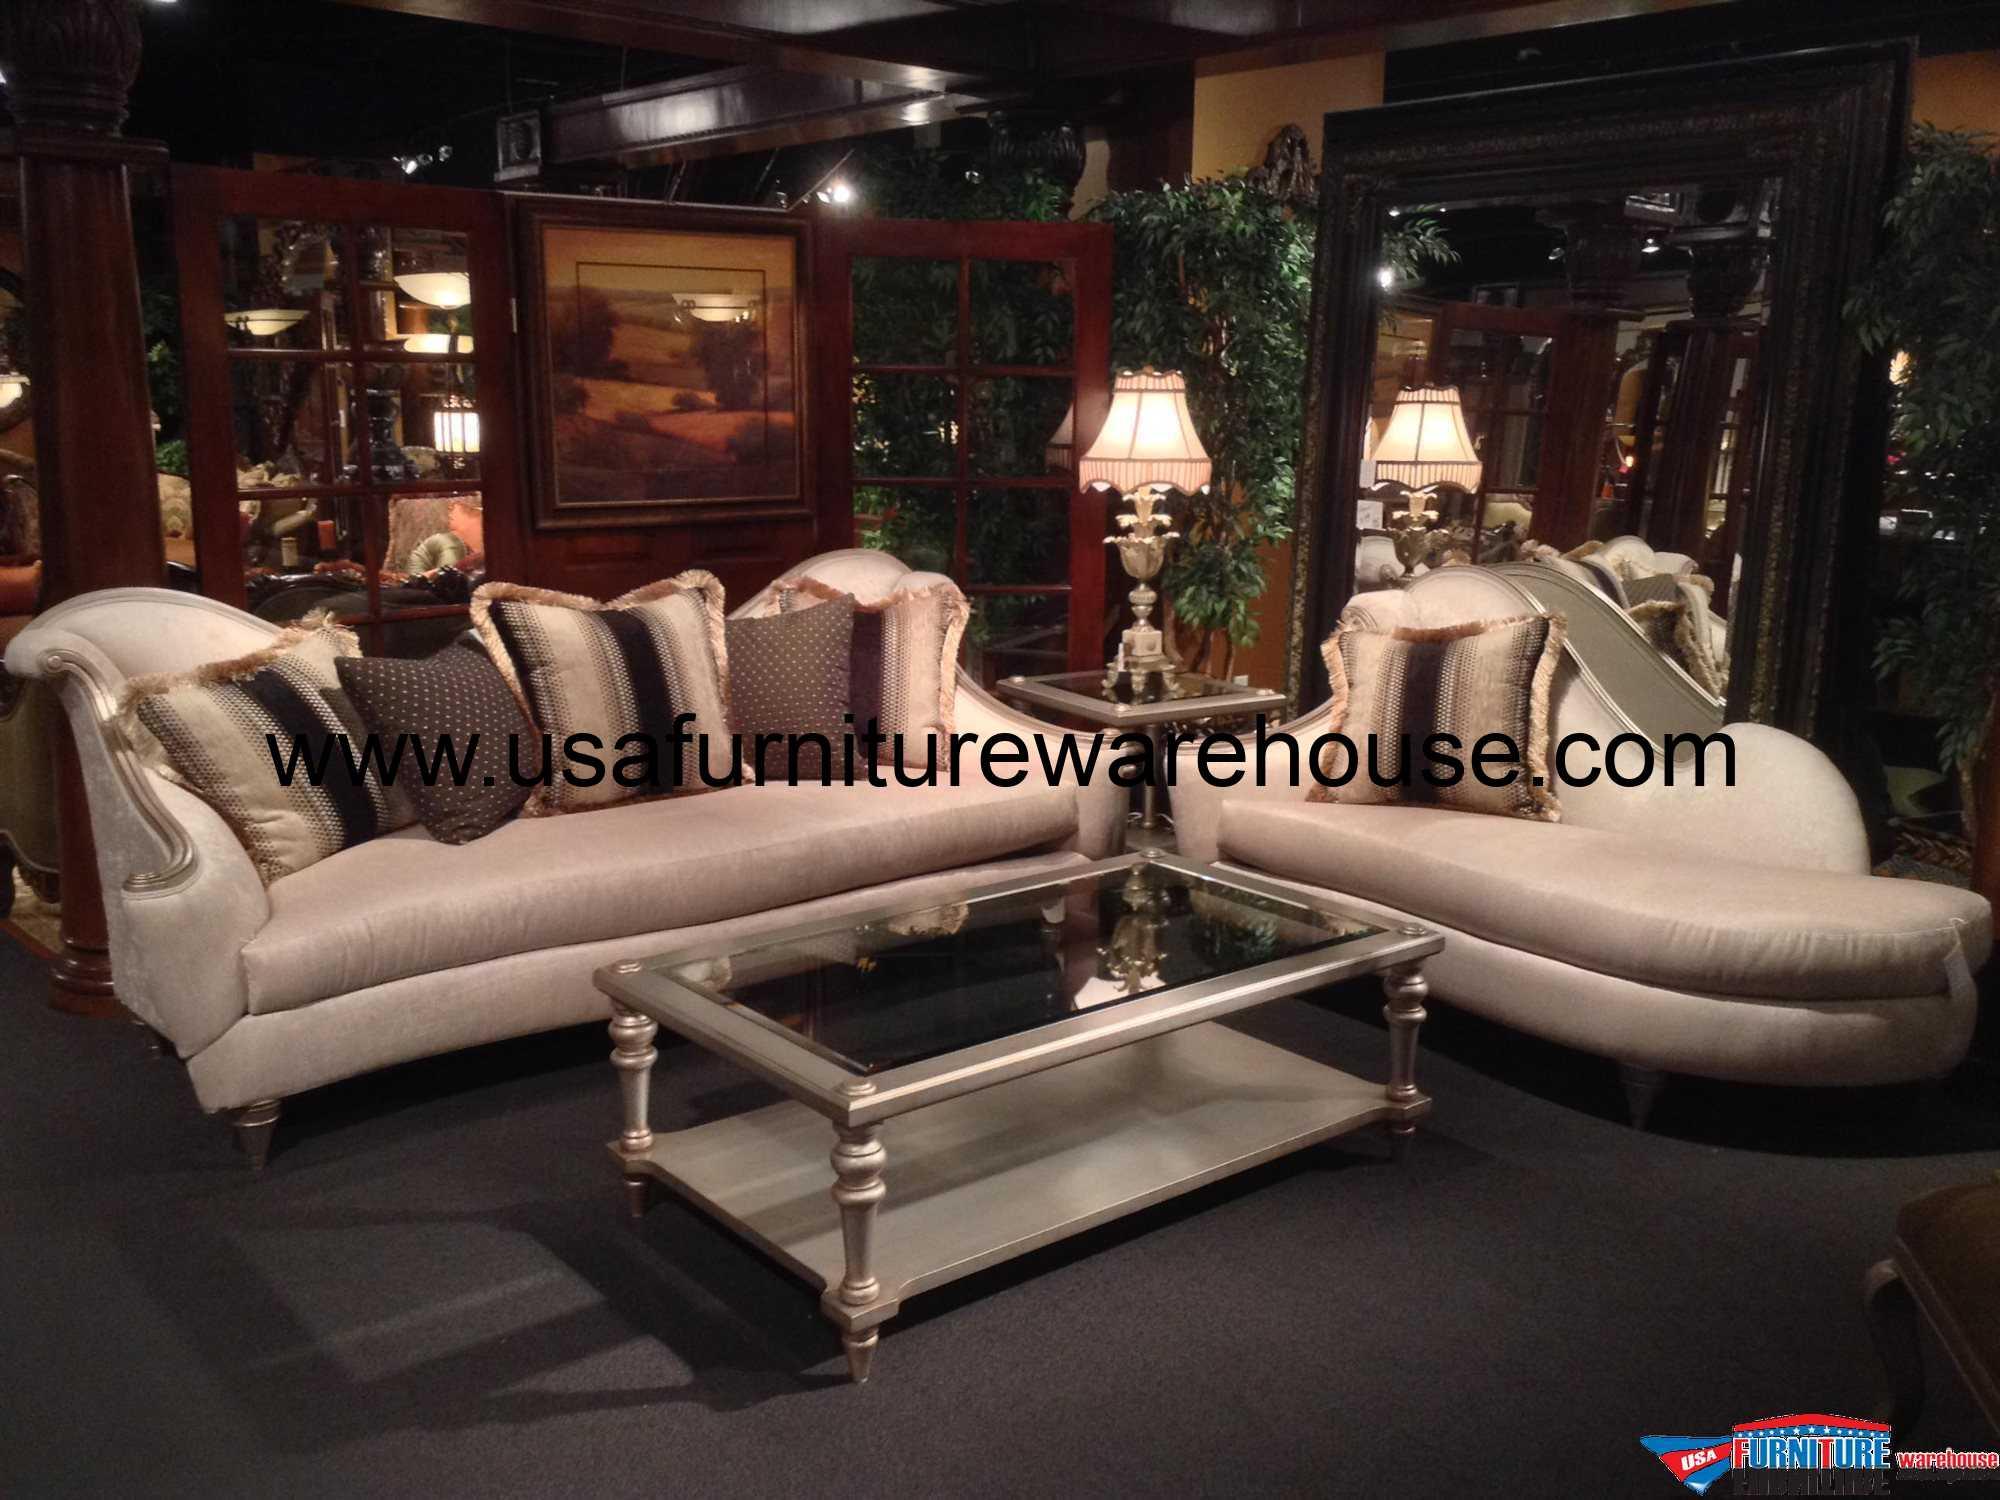 Benetti S Italia Montecito Sofa Chaise Lounge Set Usa Furniture